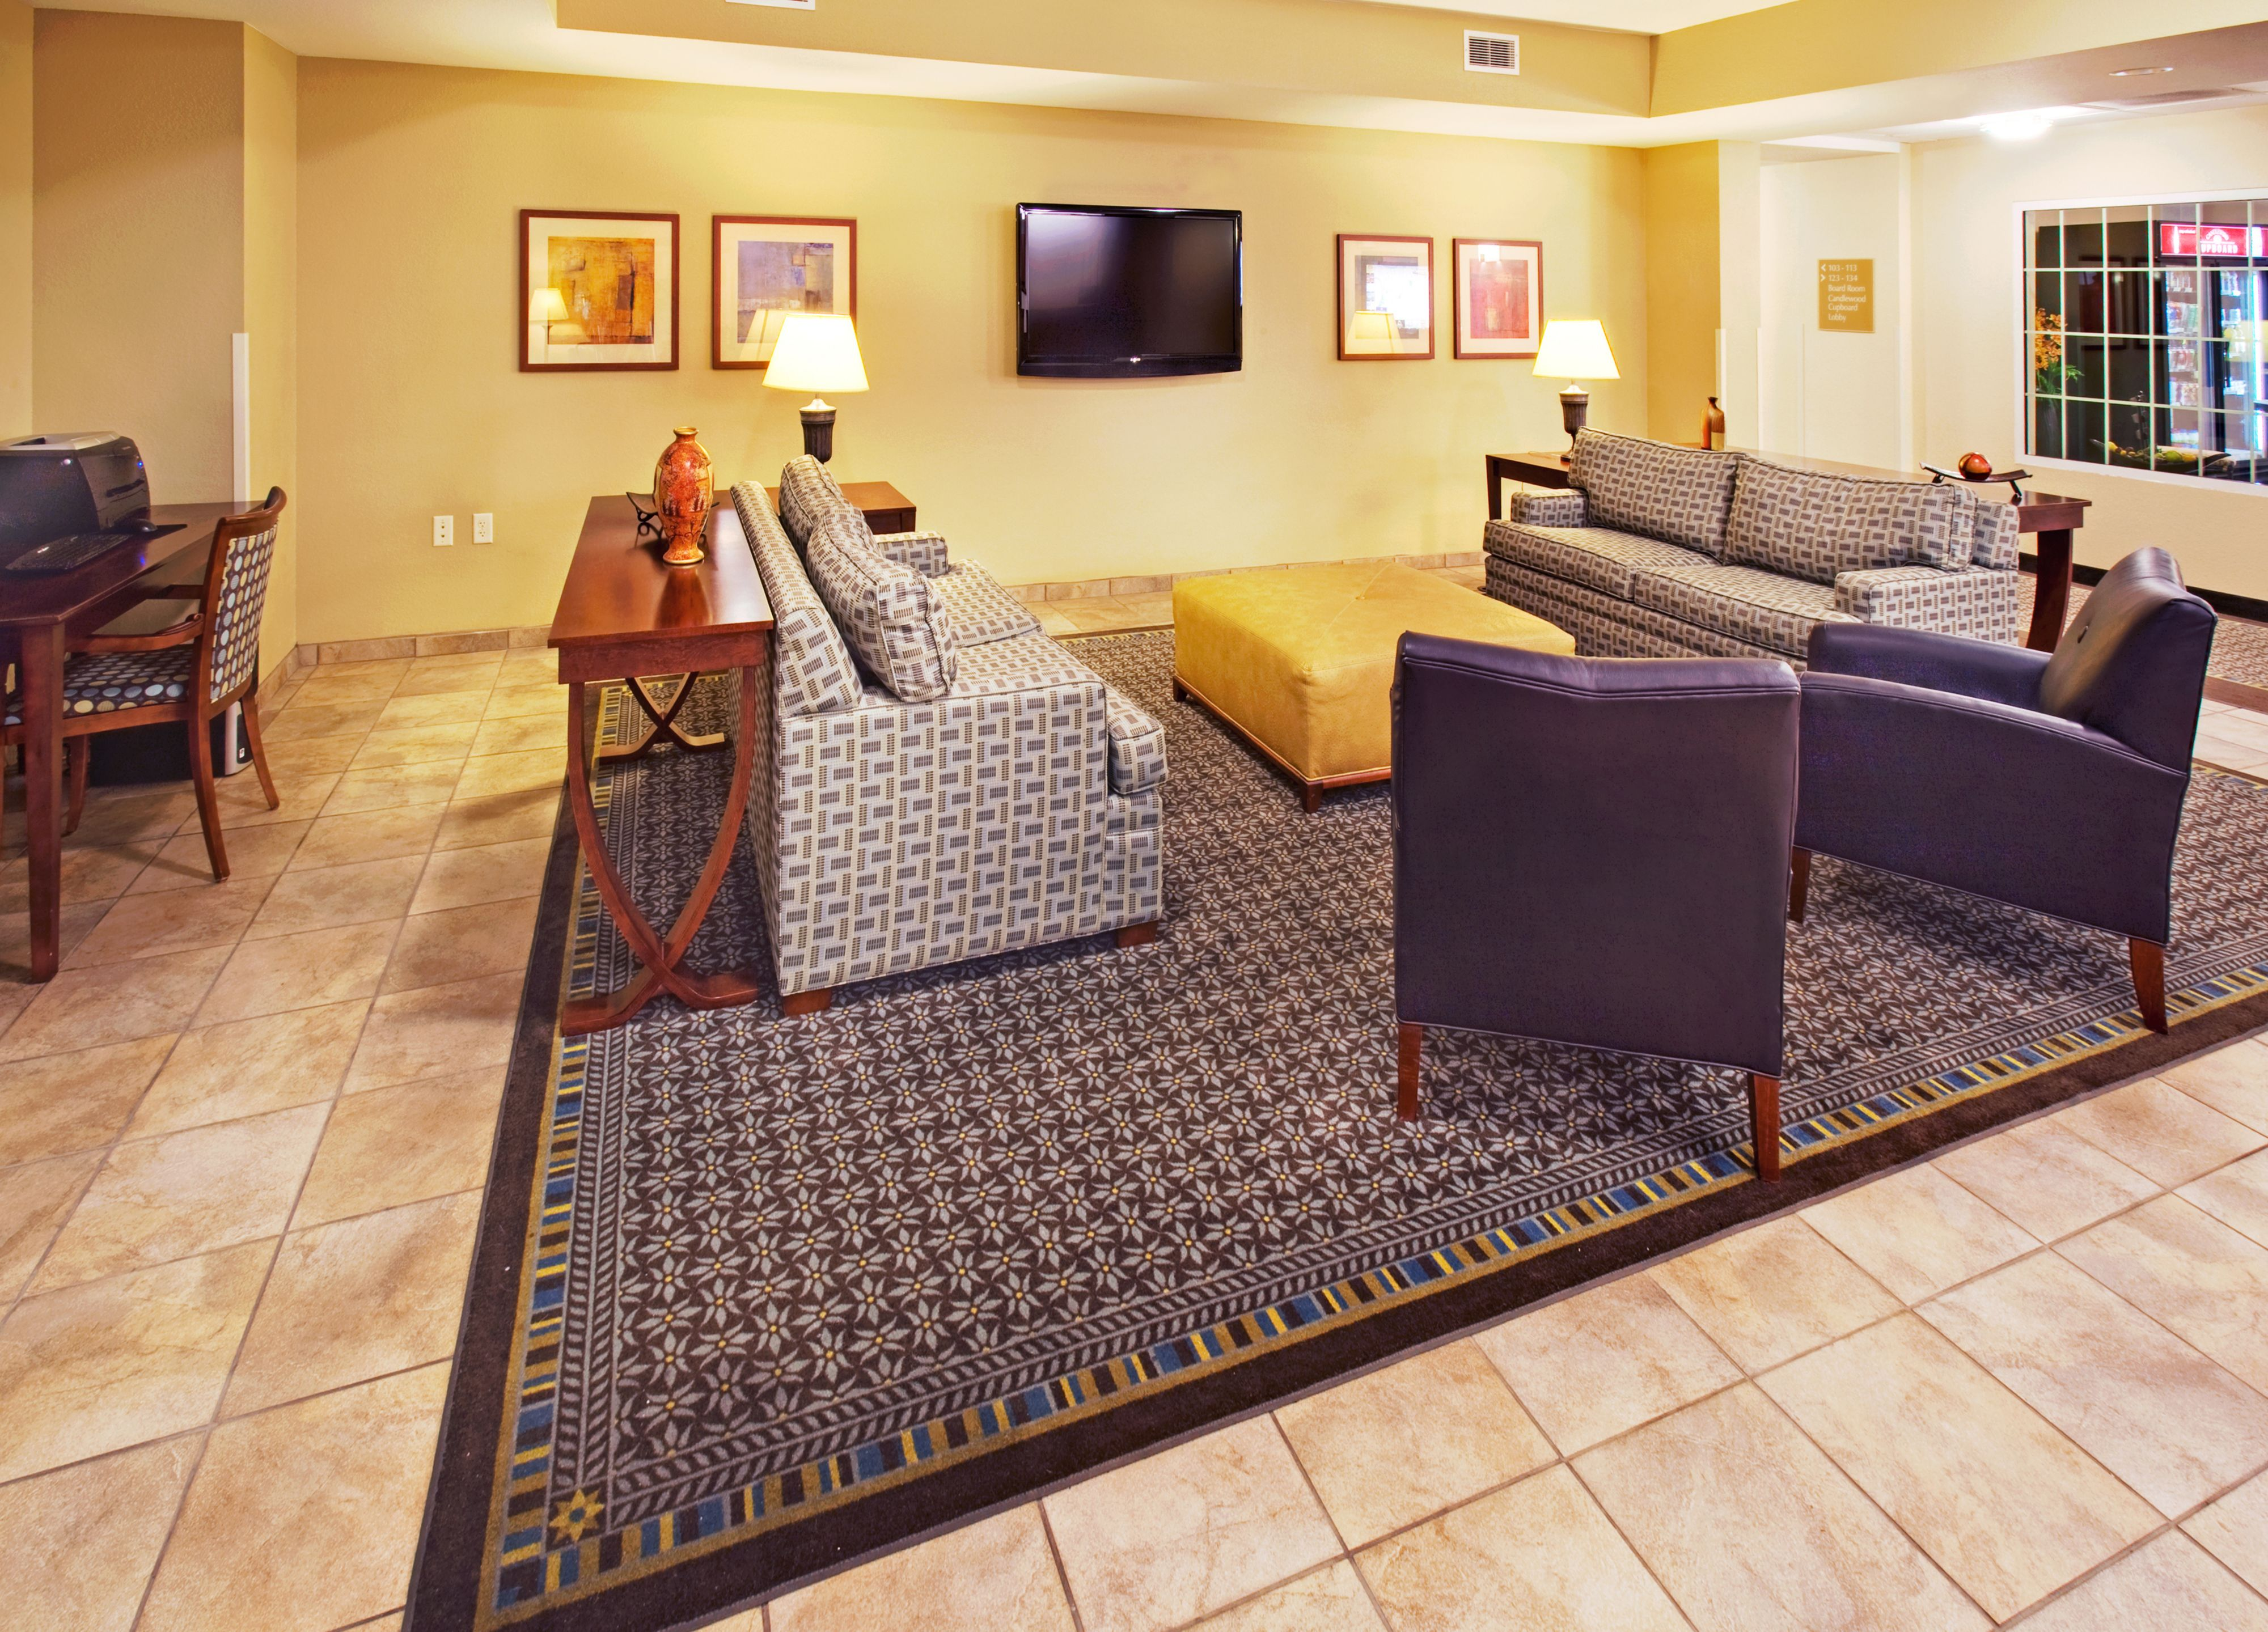 Candlewood Suites Bellevue image 4